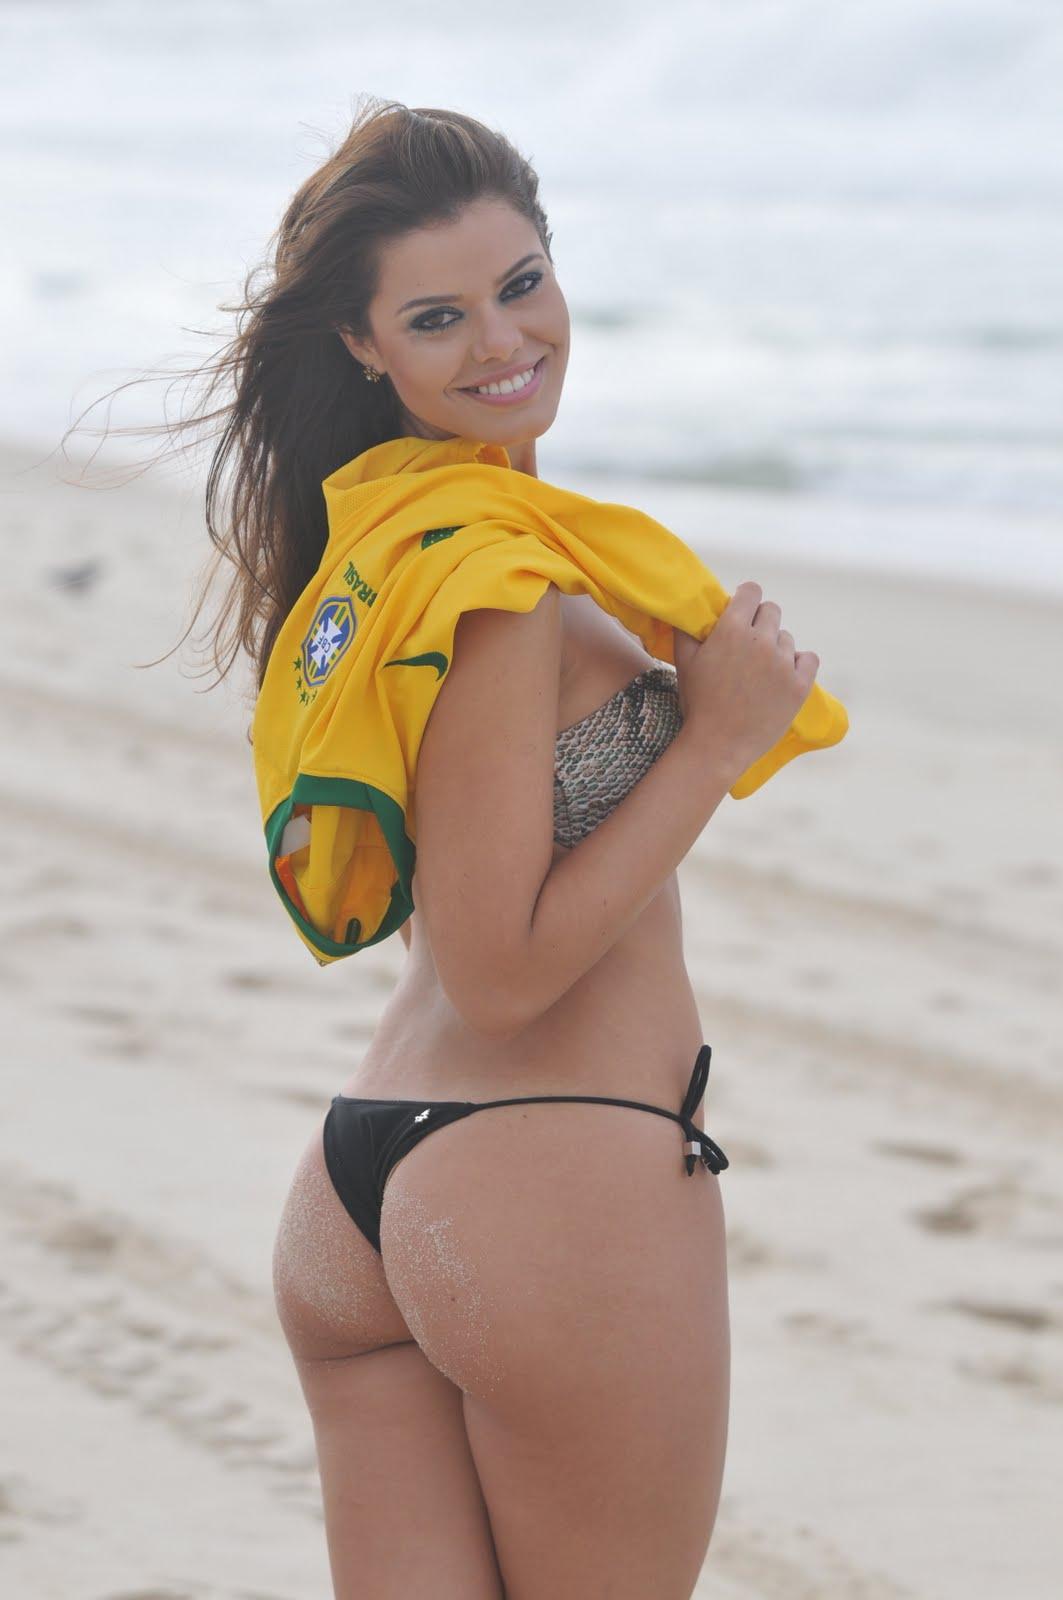 miss mundo brasil 2009, luciana bertolini.  Pew3lrmg